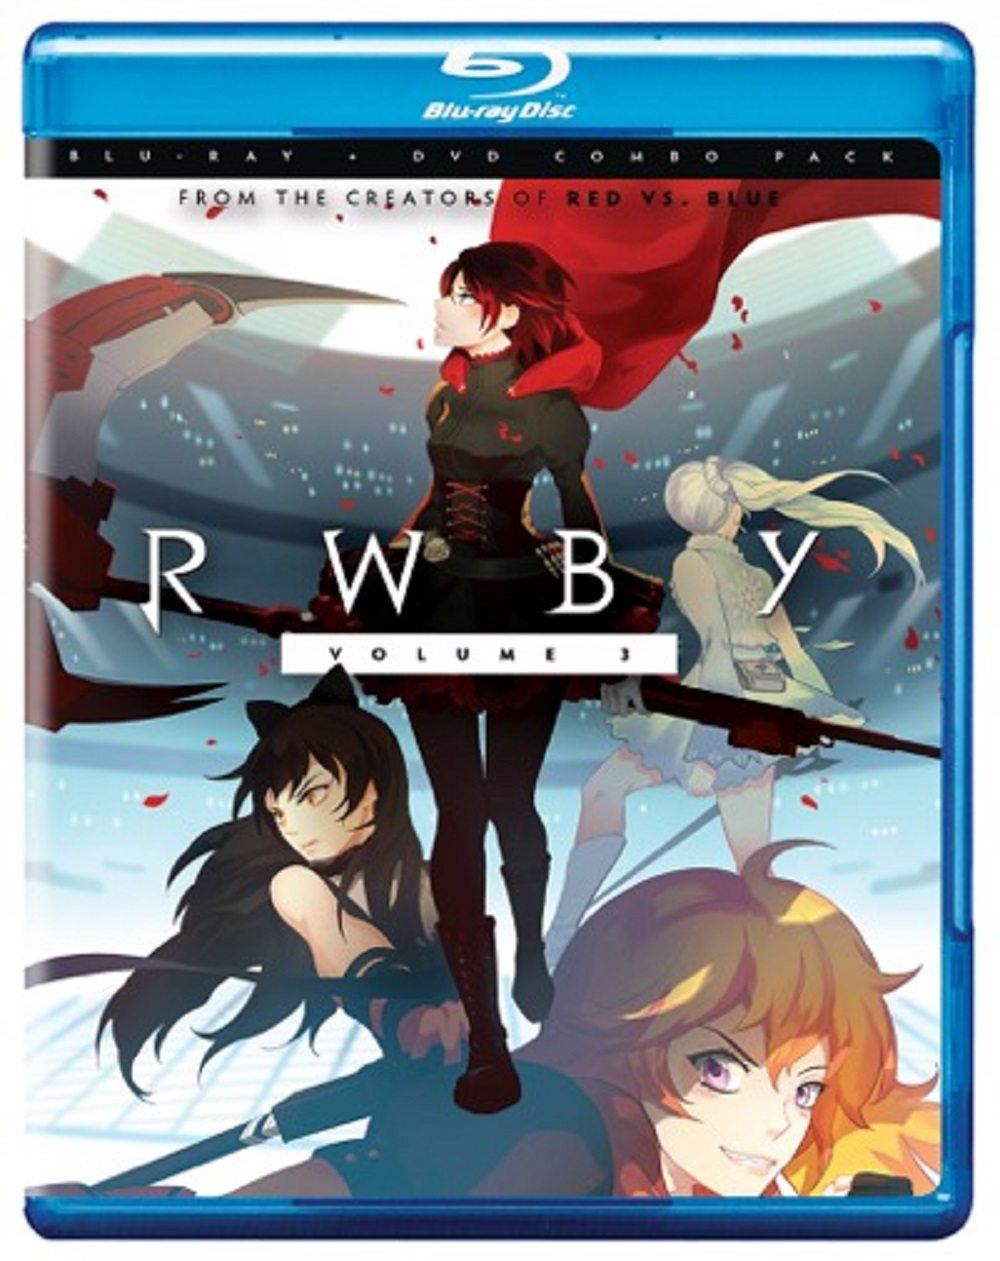 RWBY Volume 3 Blu-Ray Cover